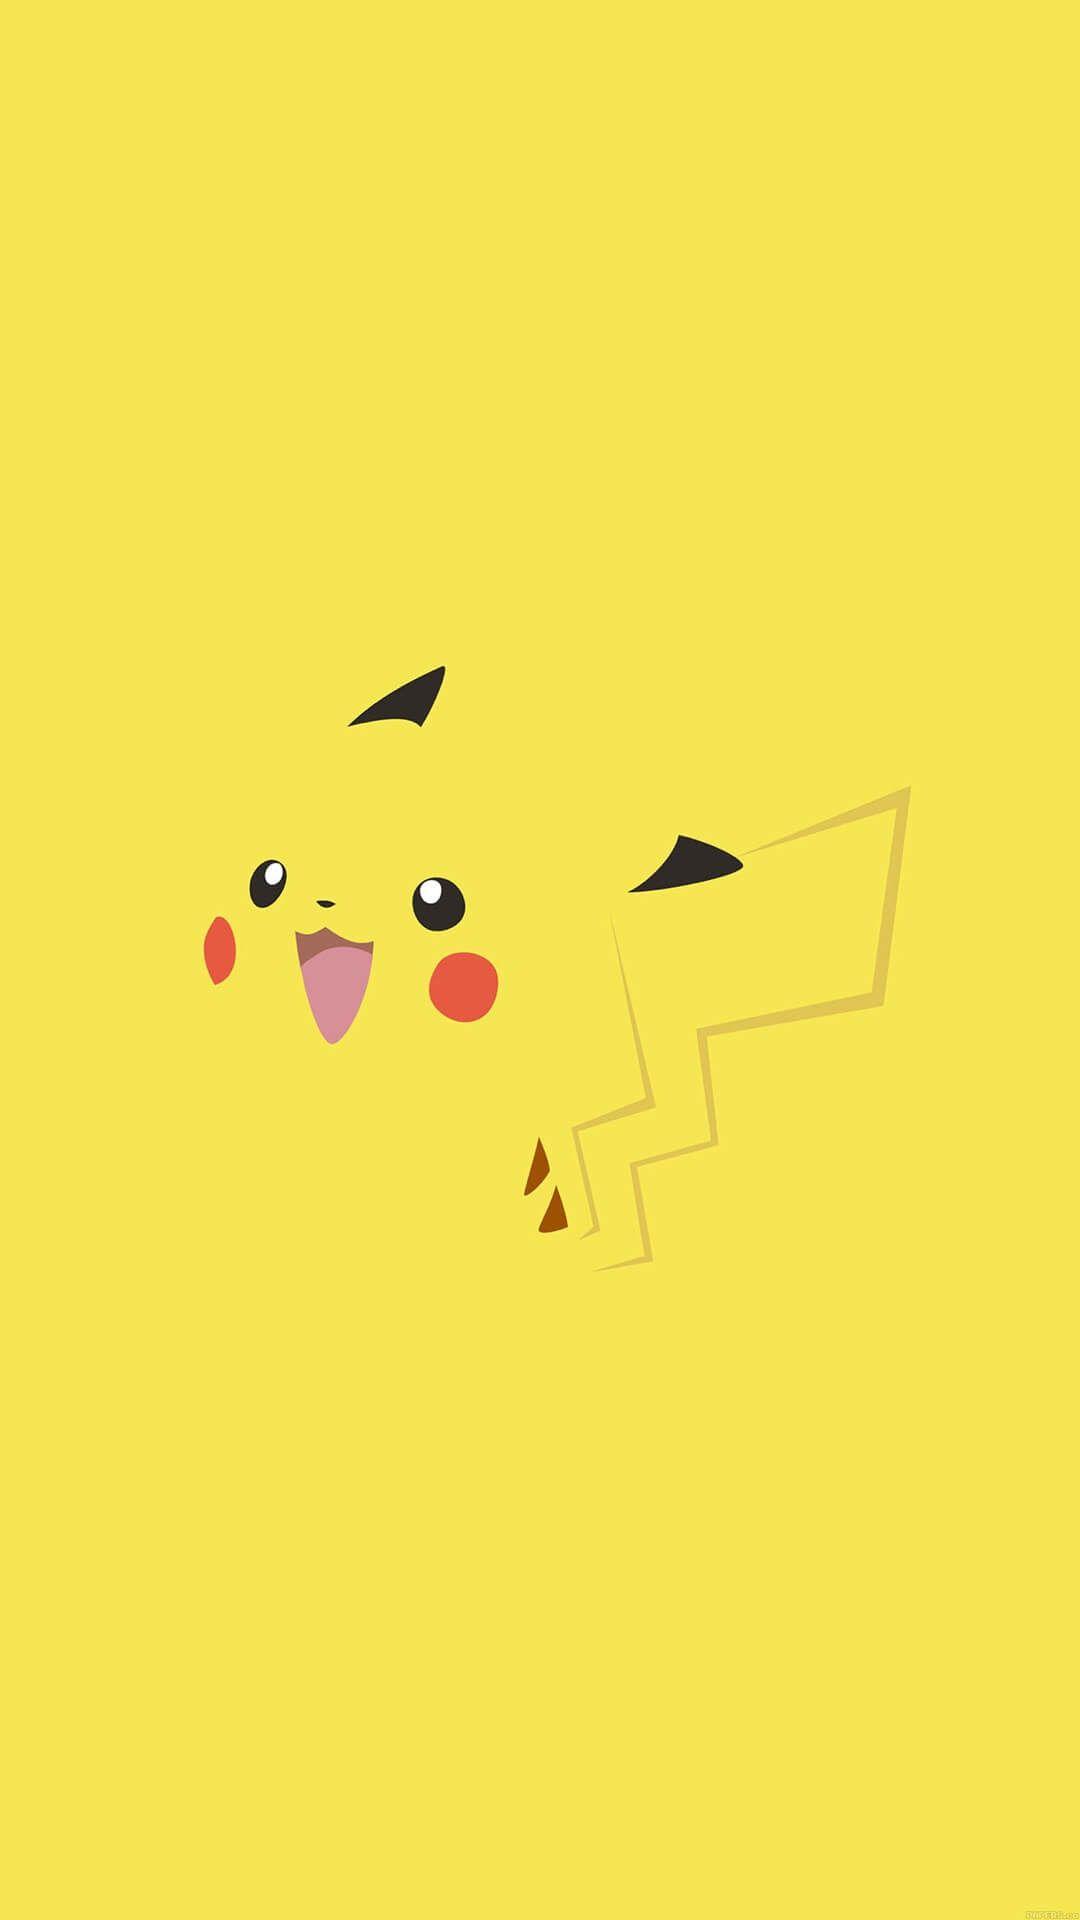 Pokemon Minimalist hd wallpaper for iPhone 7